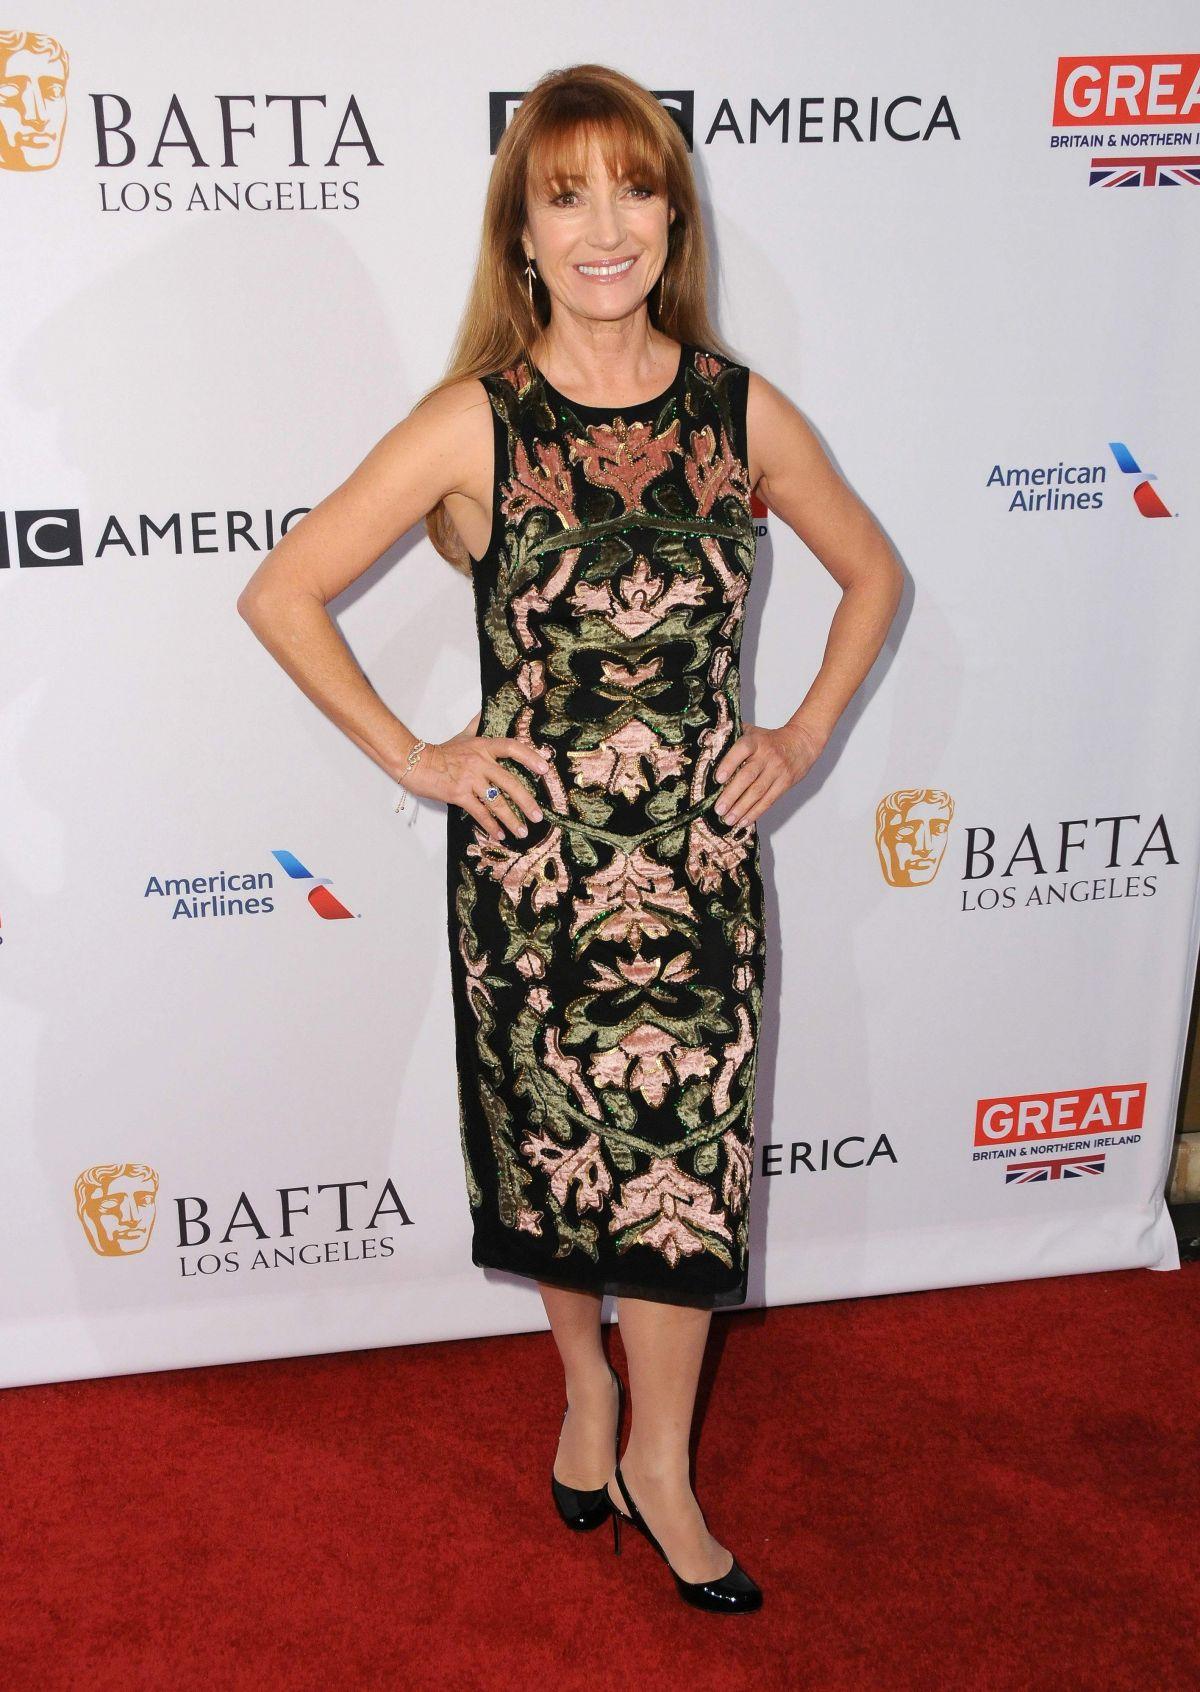 JANE SEYMOUR at Bafta Tea Party in Los Angeles 01/07/2016